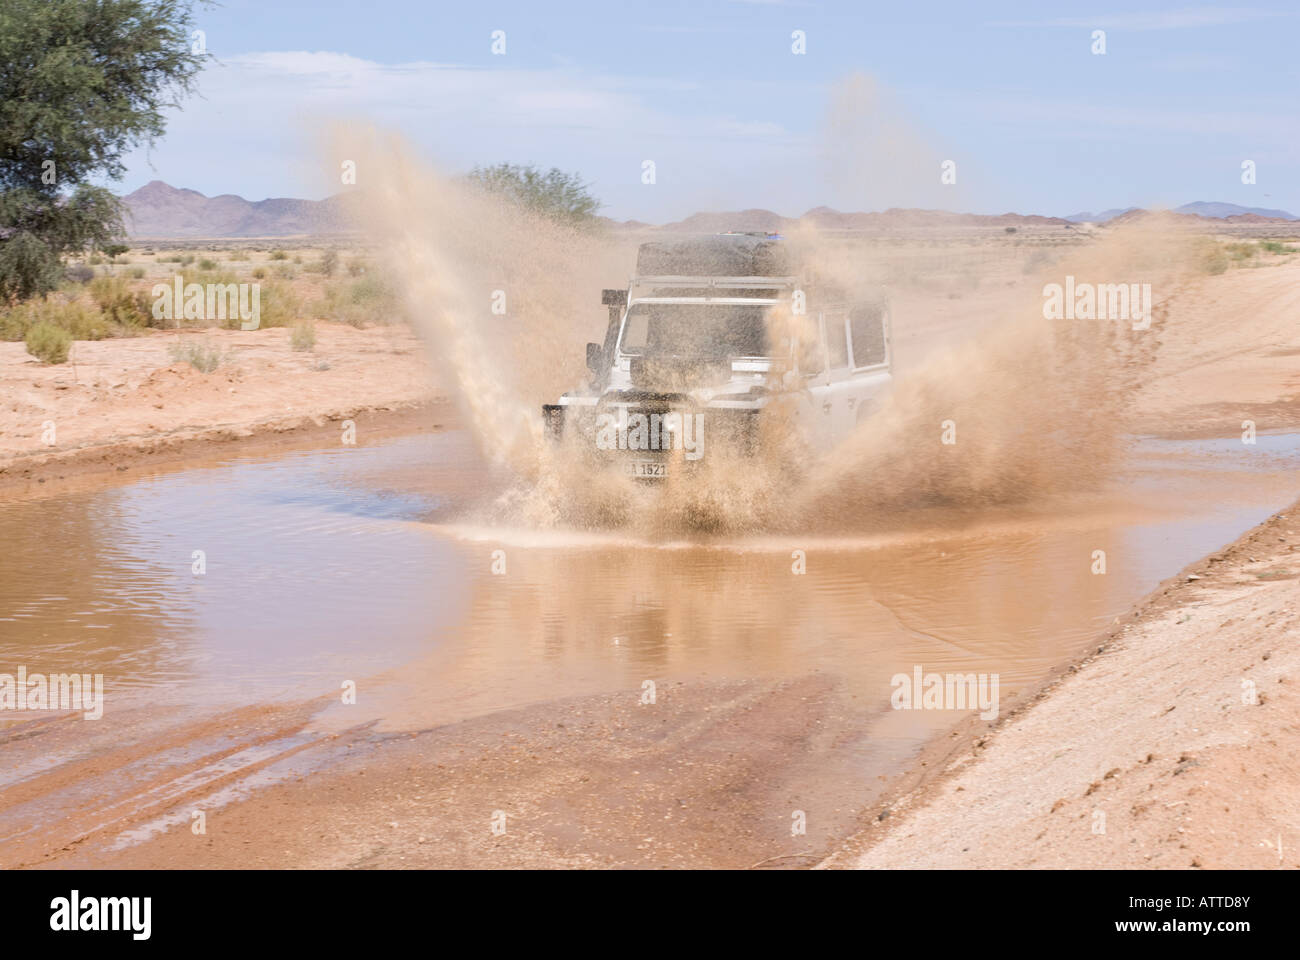 Land Rover blasting through standing water in Namibian desert in Namibia - Stock Image